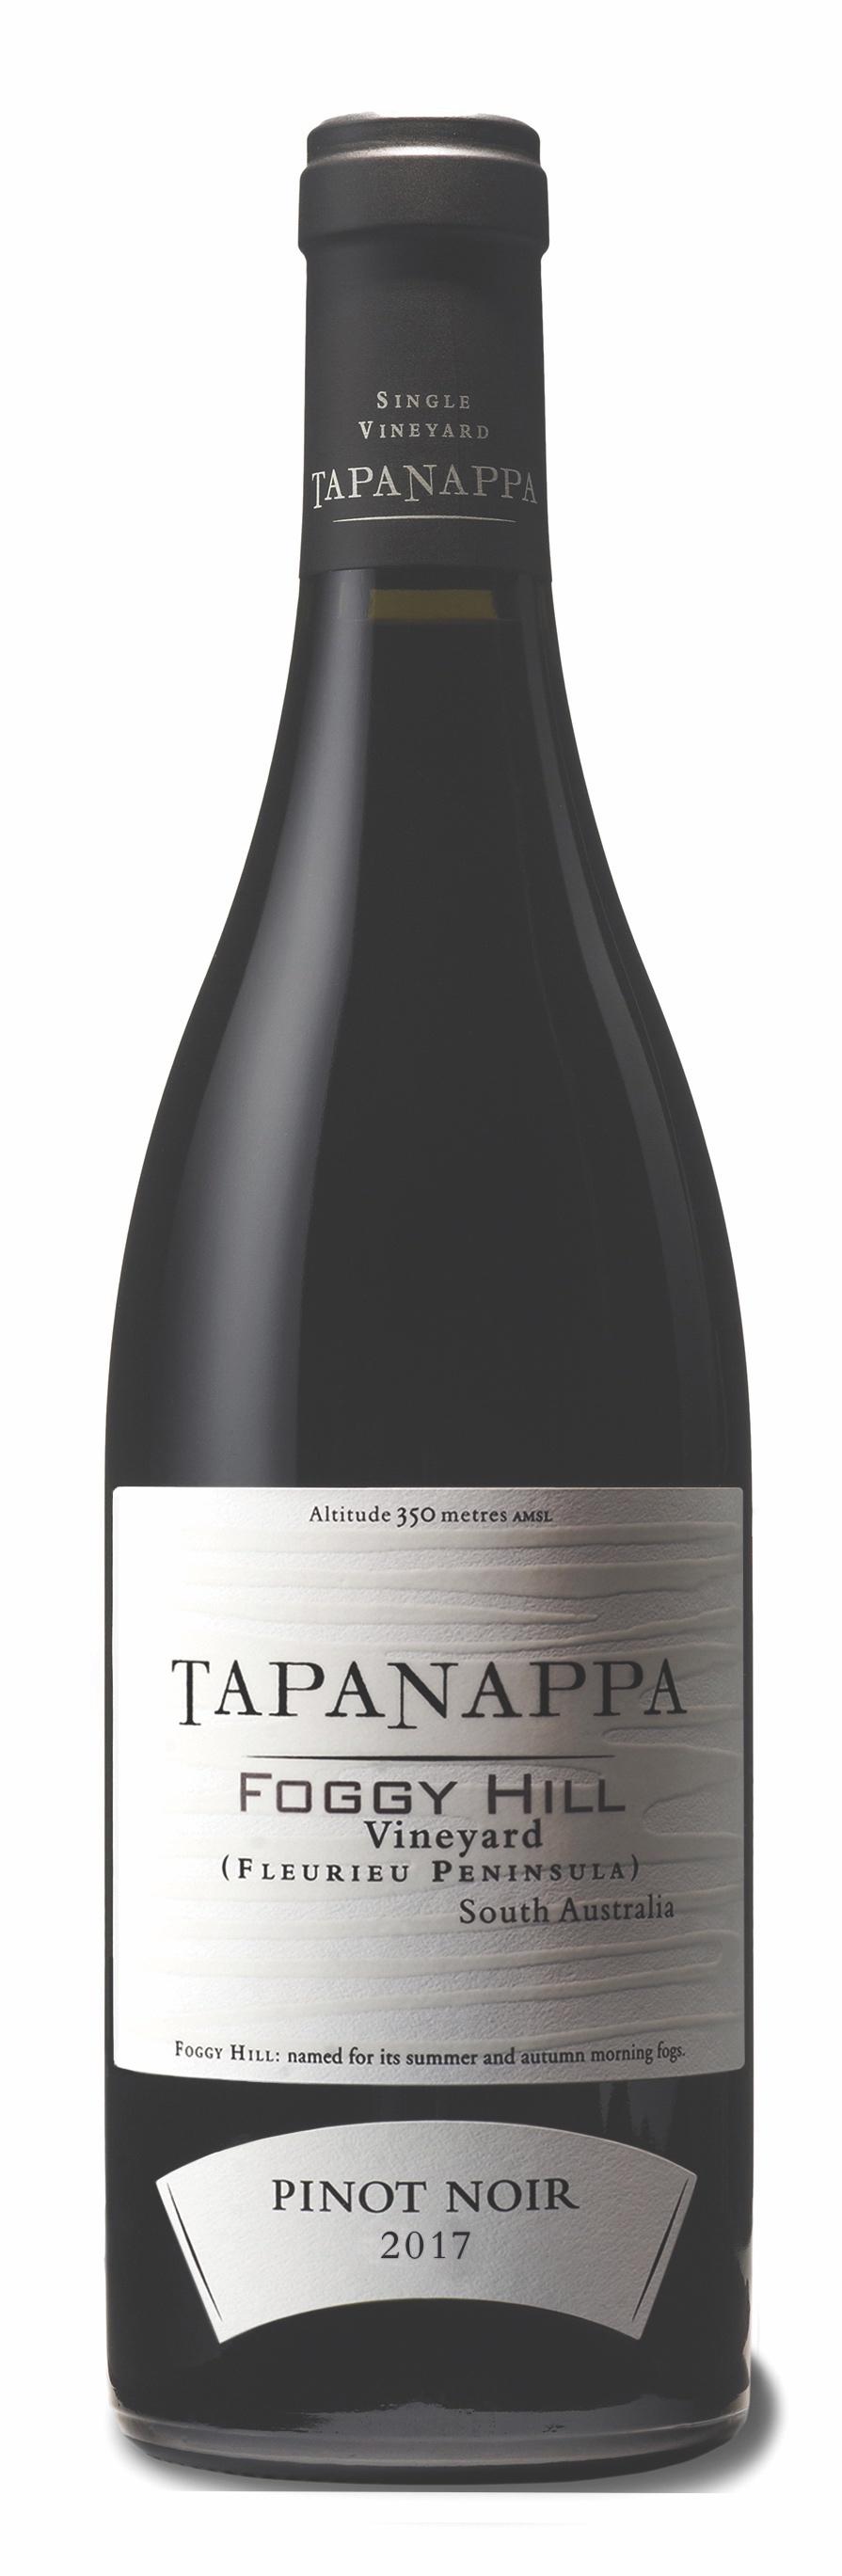 Tapanappa Foggy Hill Vineyard 2017 Pinot Noir bottle shot